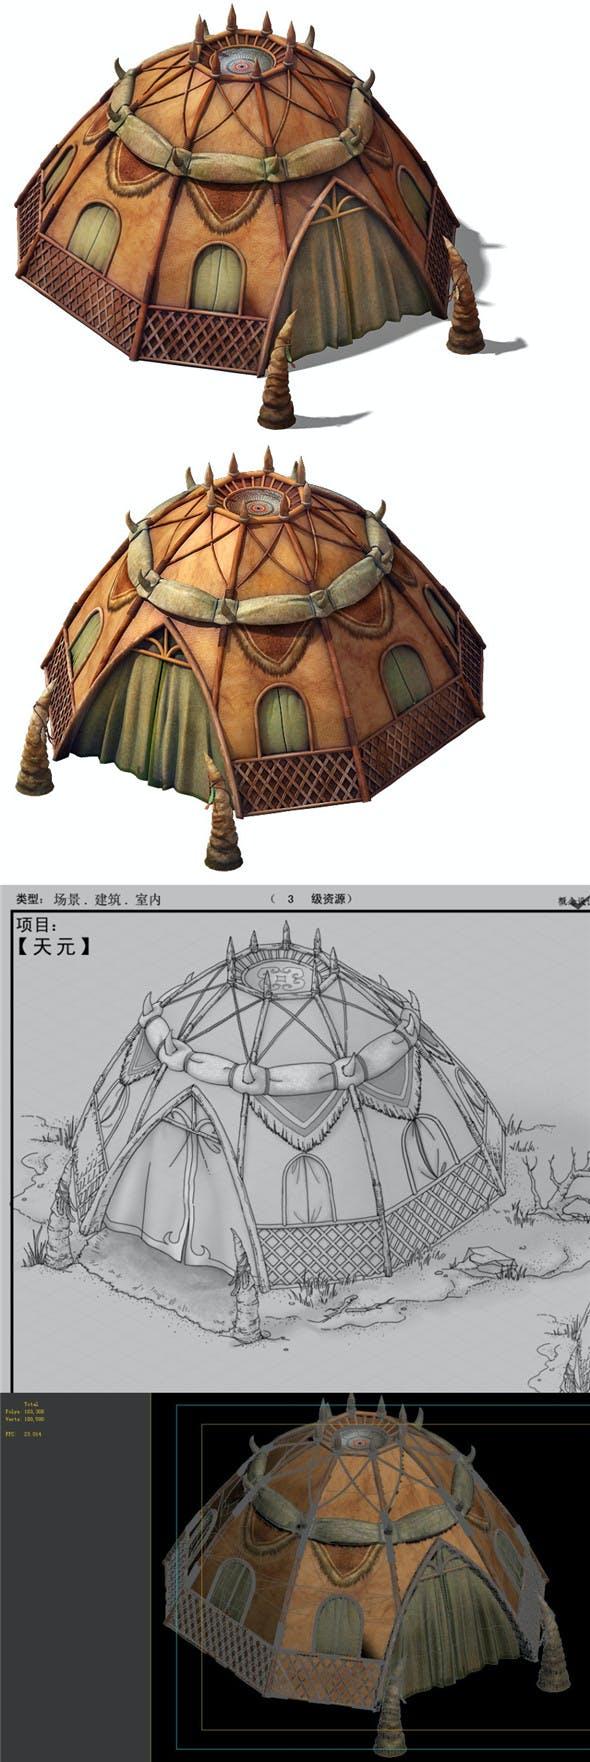 Desert Gobi - Dome Tents 01 - 3DOcean Item for Sale